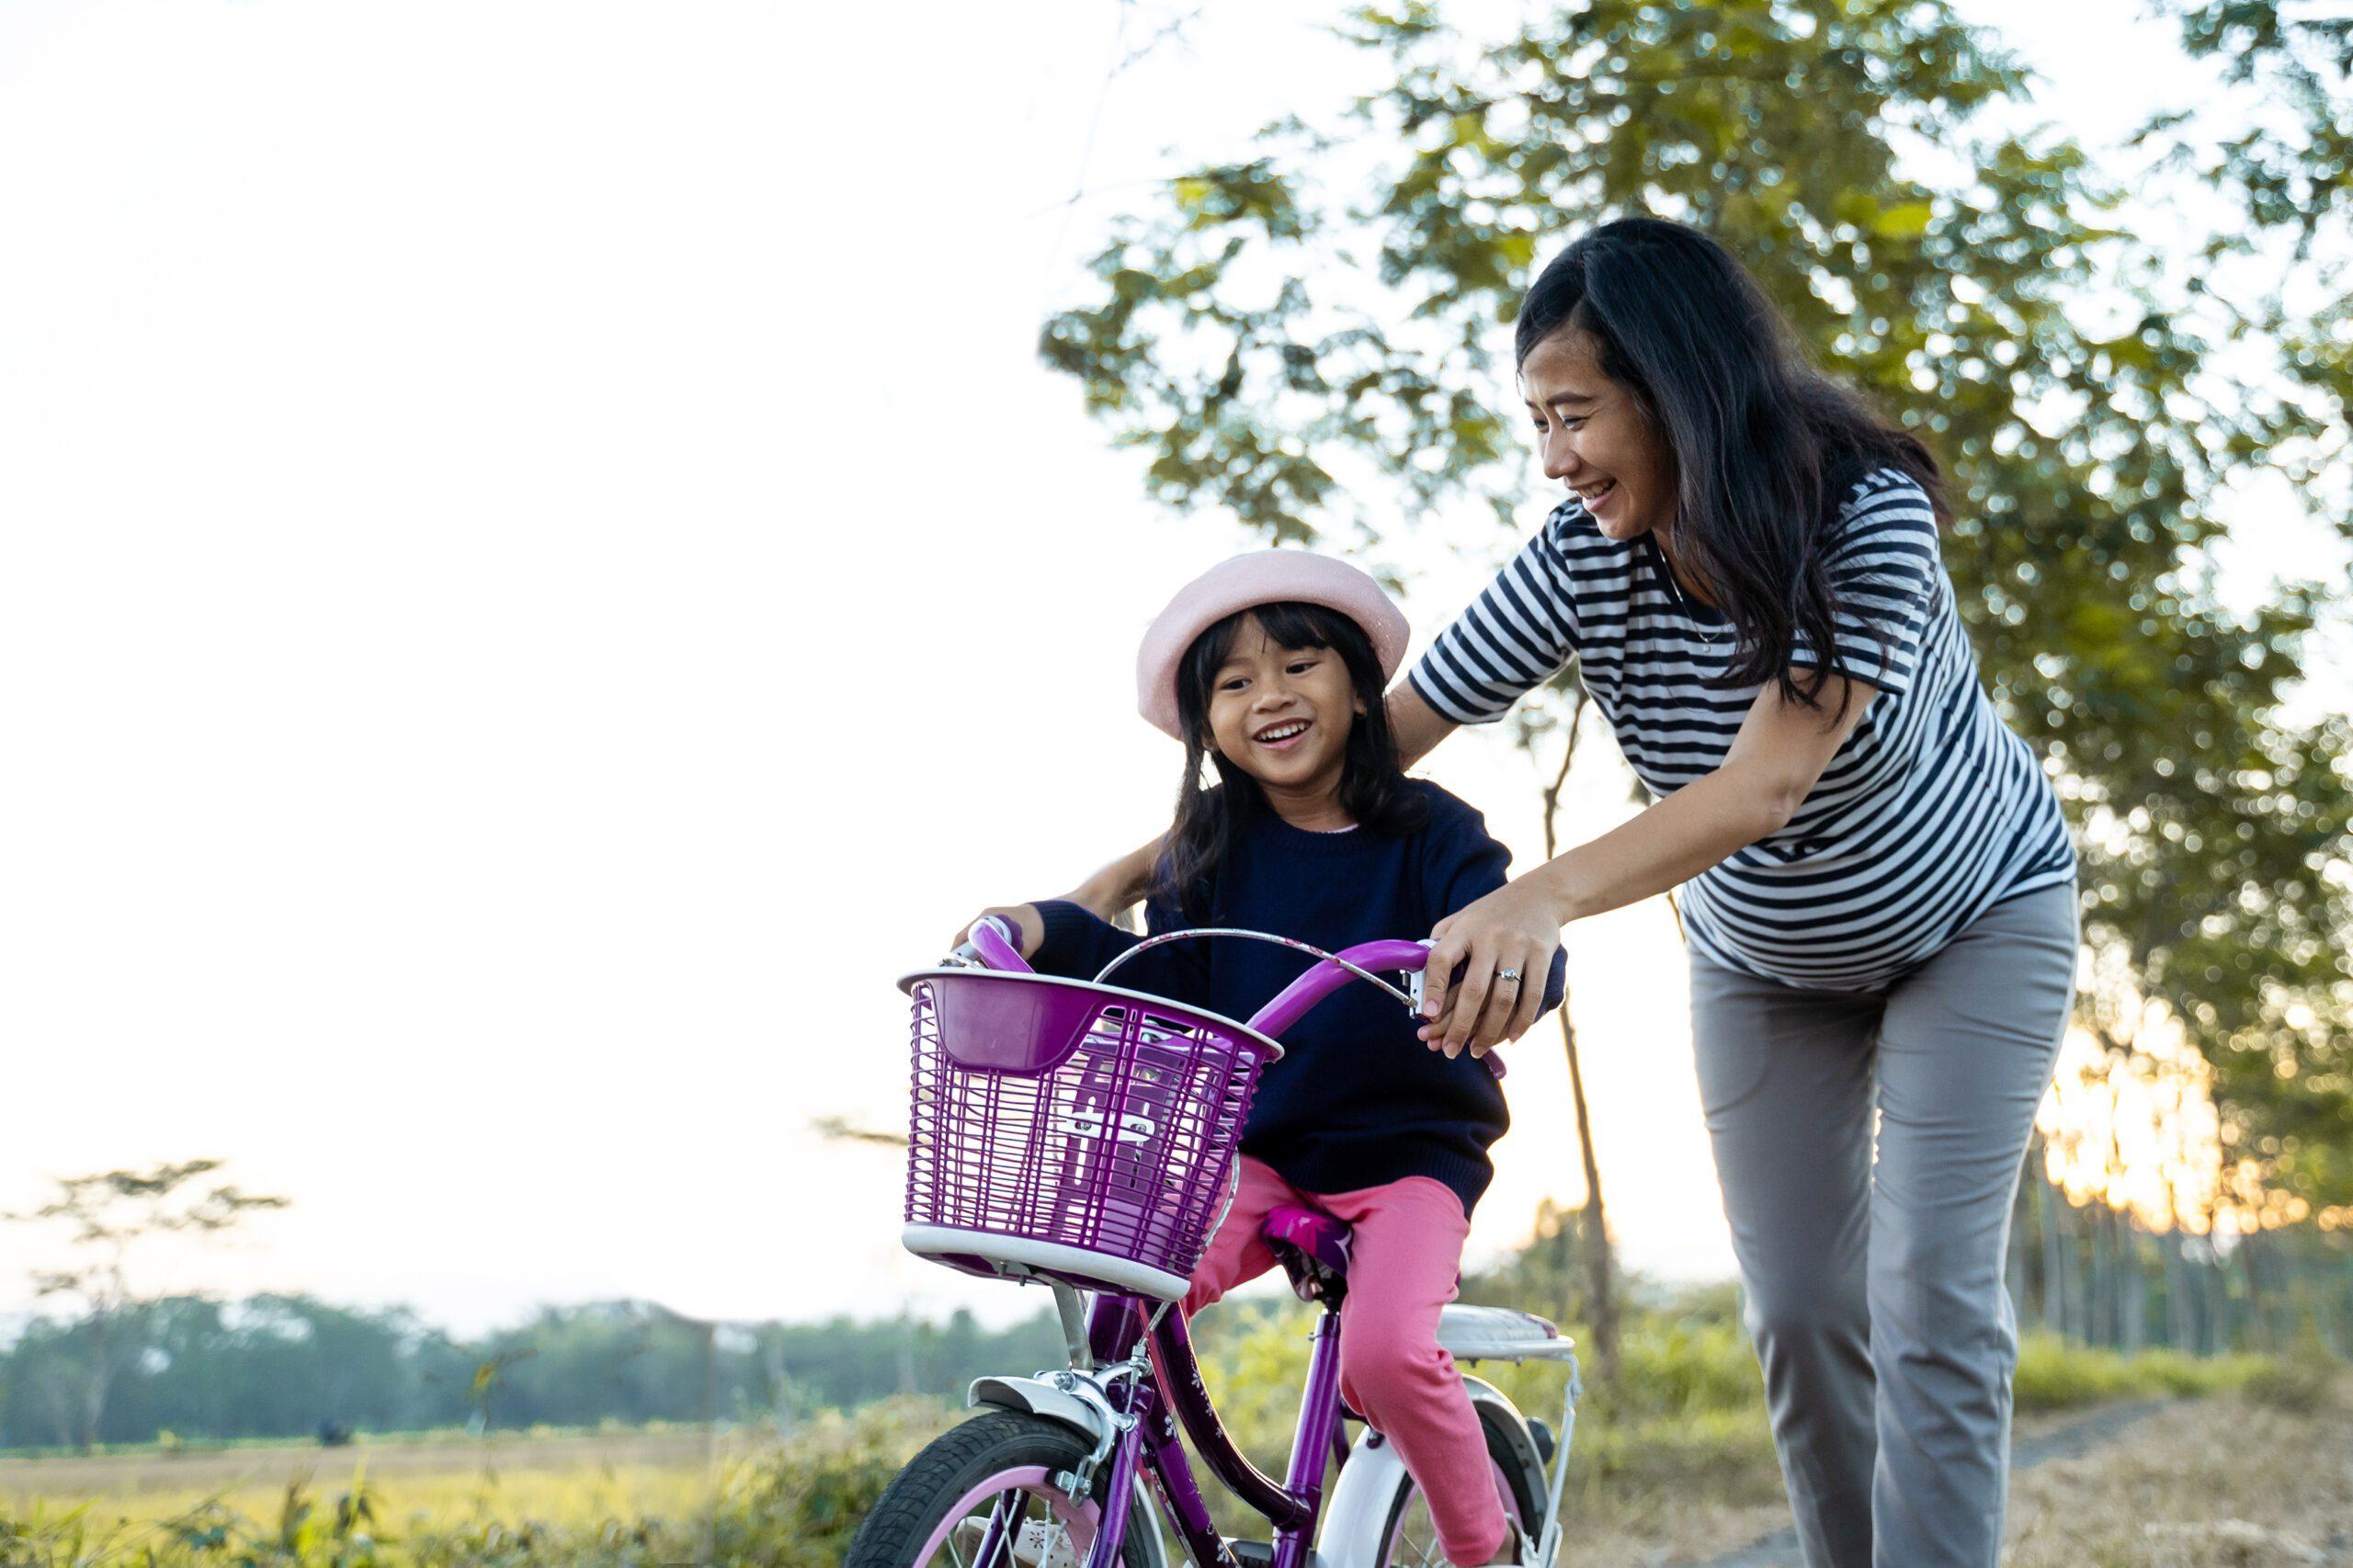 teaching a kid how to ride a bike